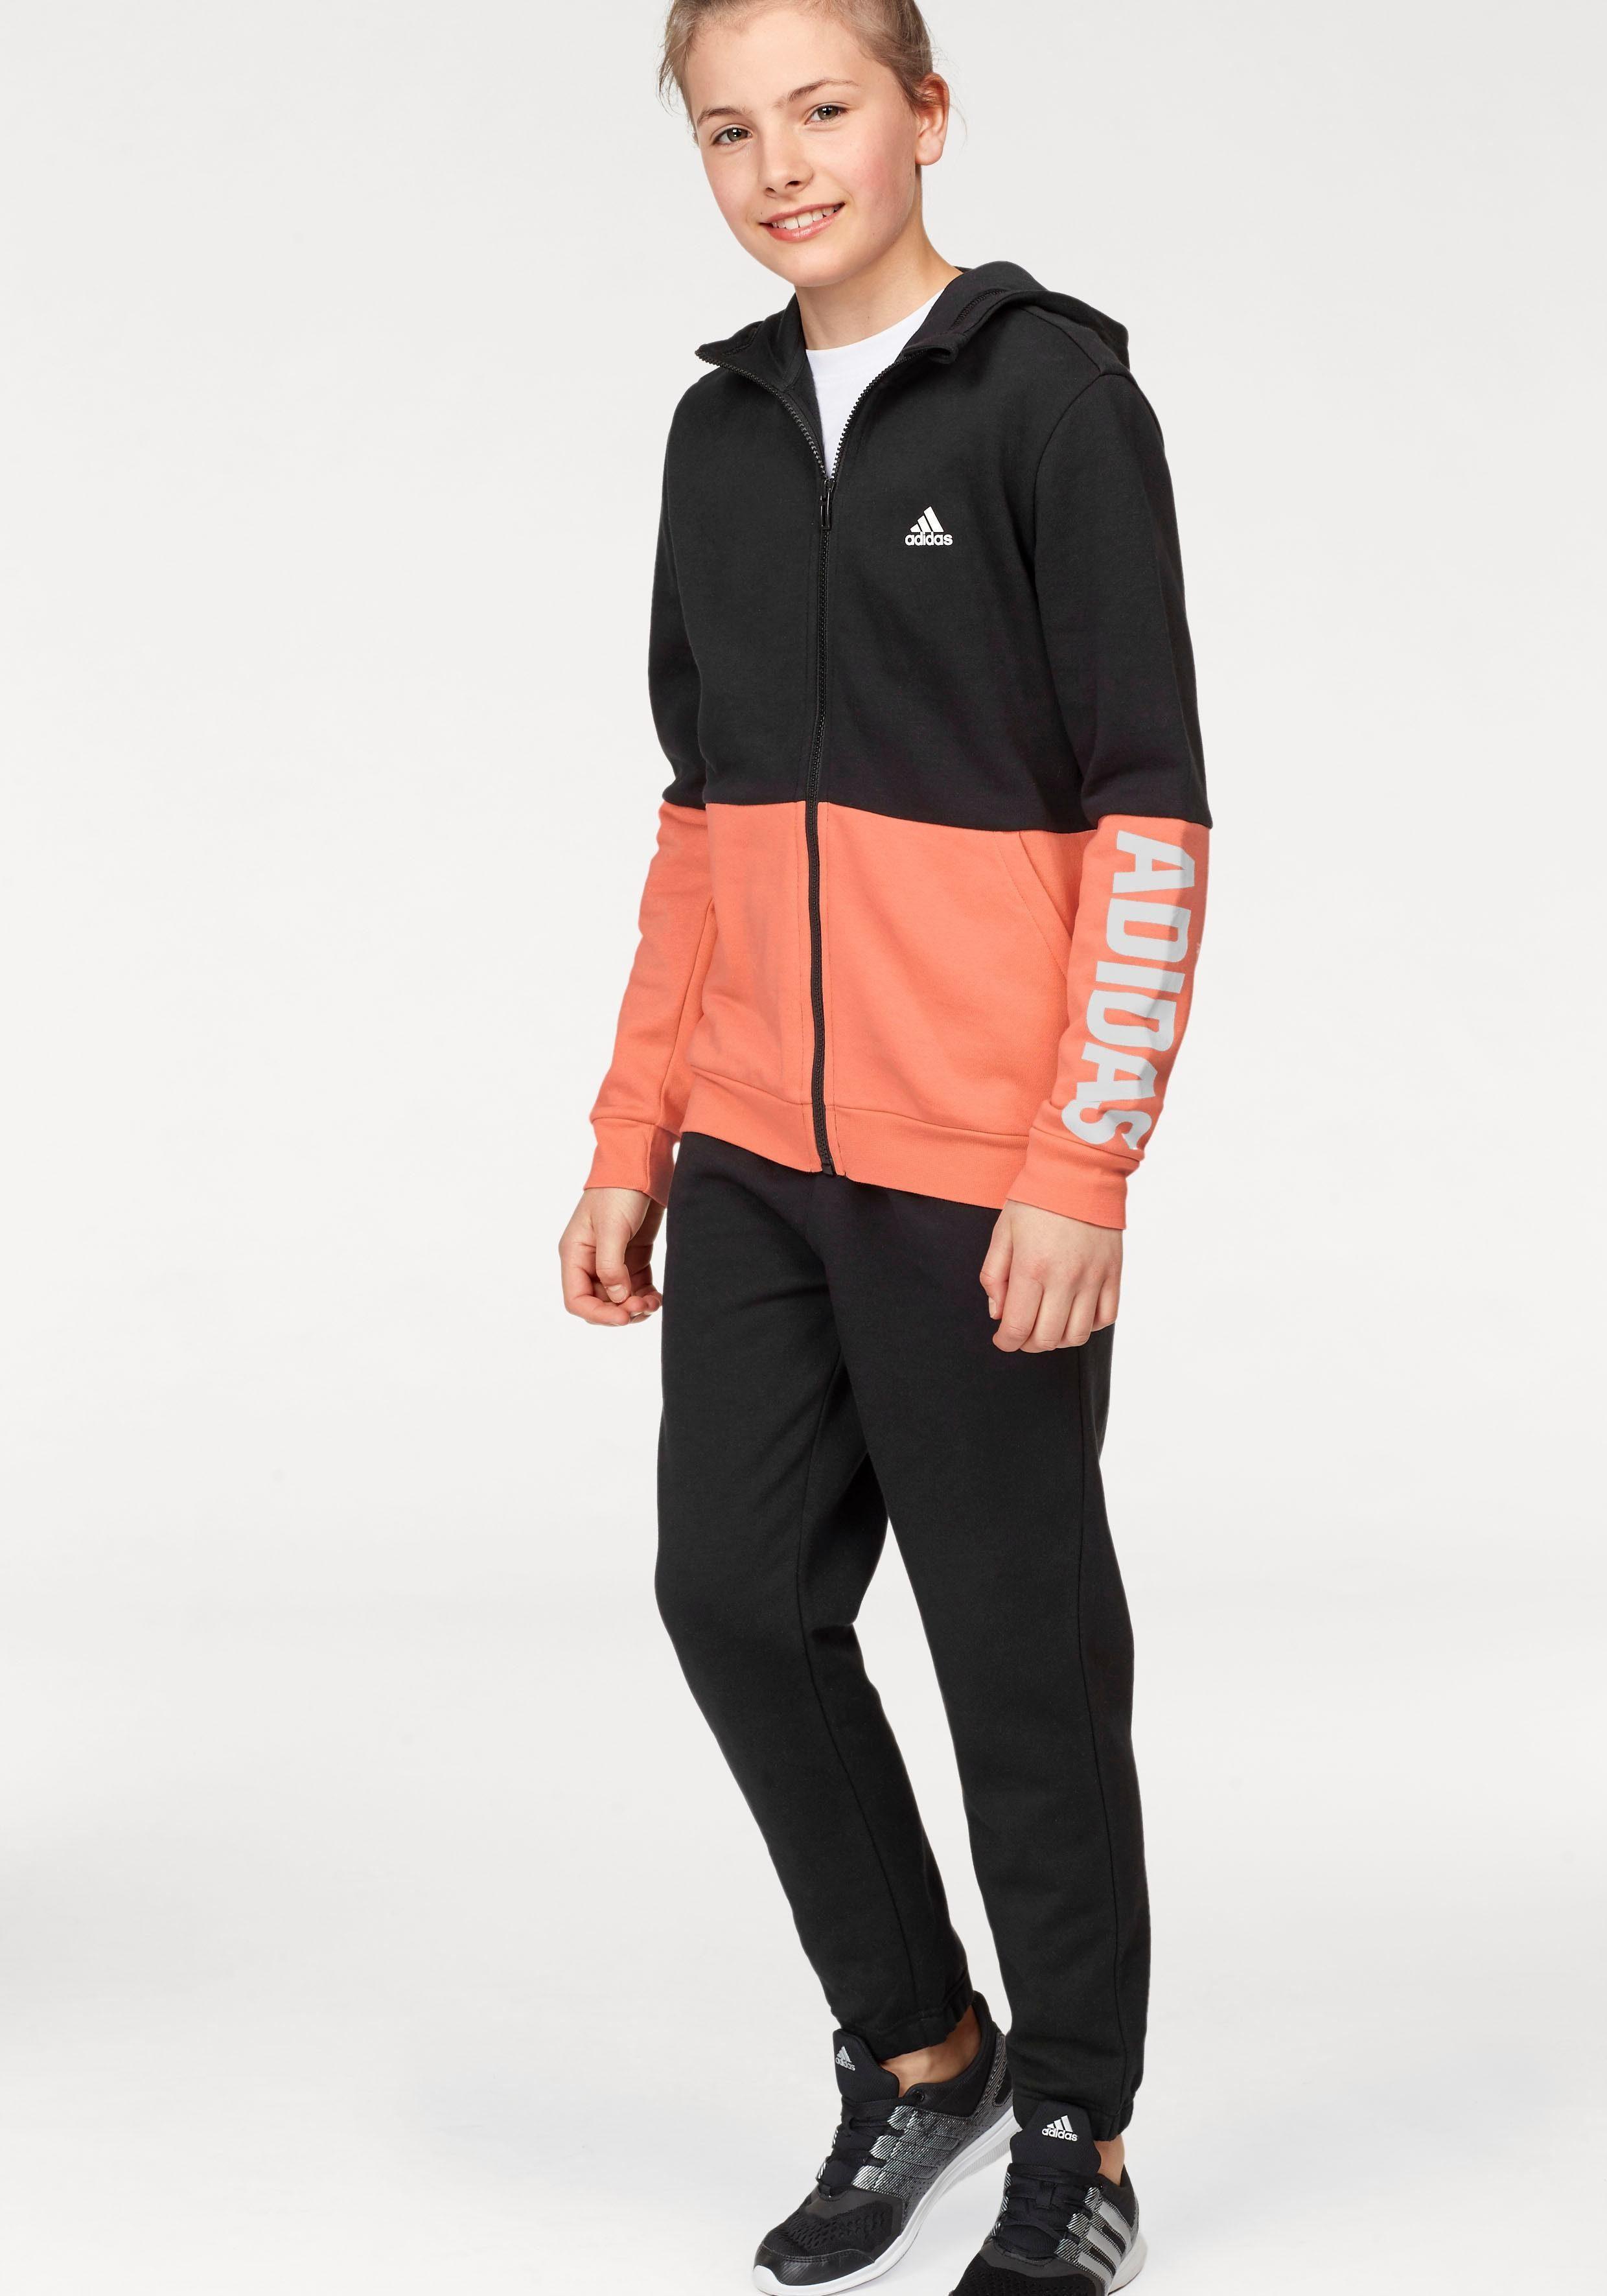 adidas Performance Trainingsanzug »CO TRACK SUIT« (Set, 2 tlg) online kaufen | OTTO